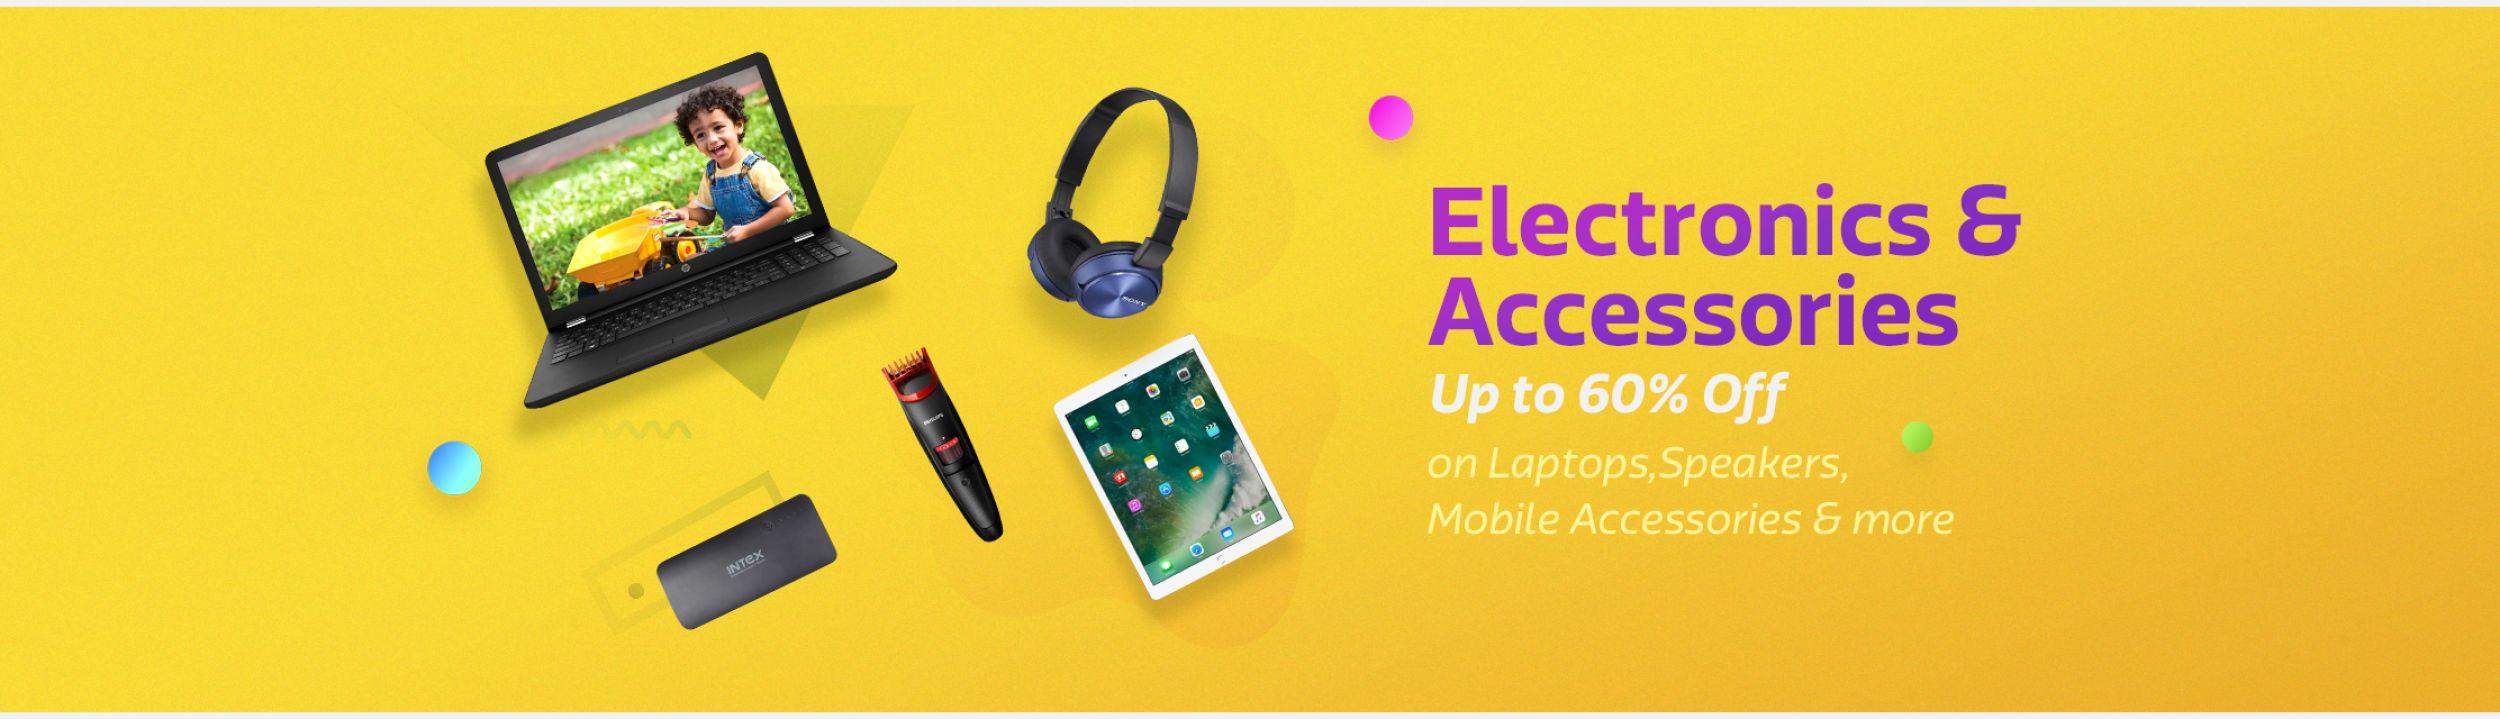 Flipkart ( Big Shopping Days ) Offer : Get upto 80% off on Electronics